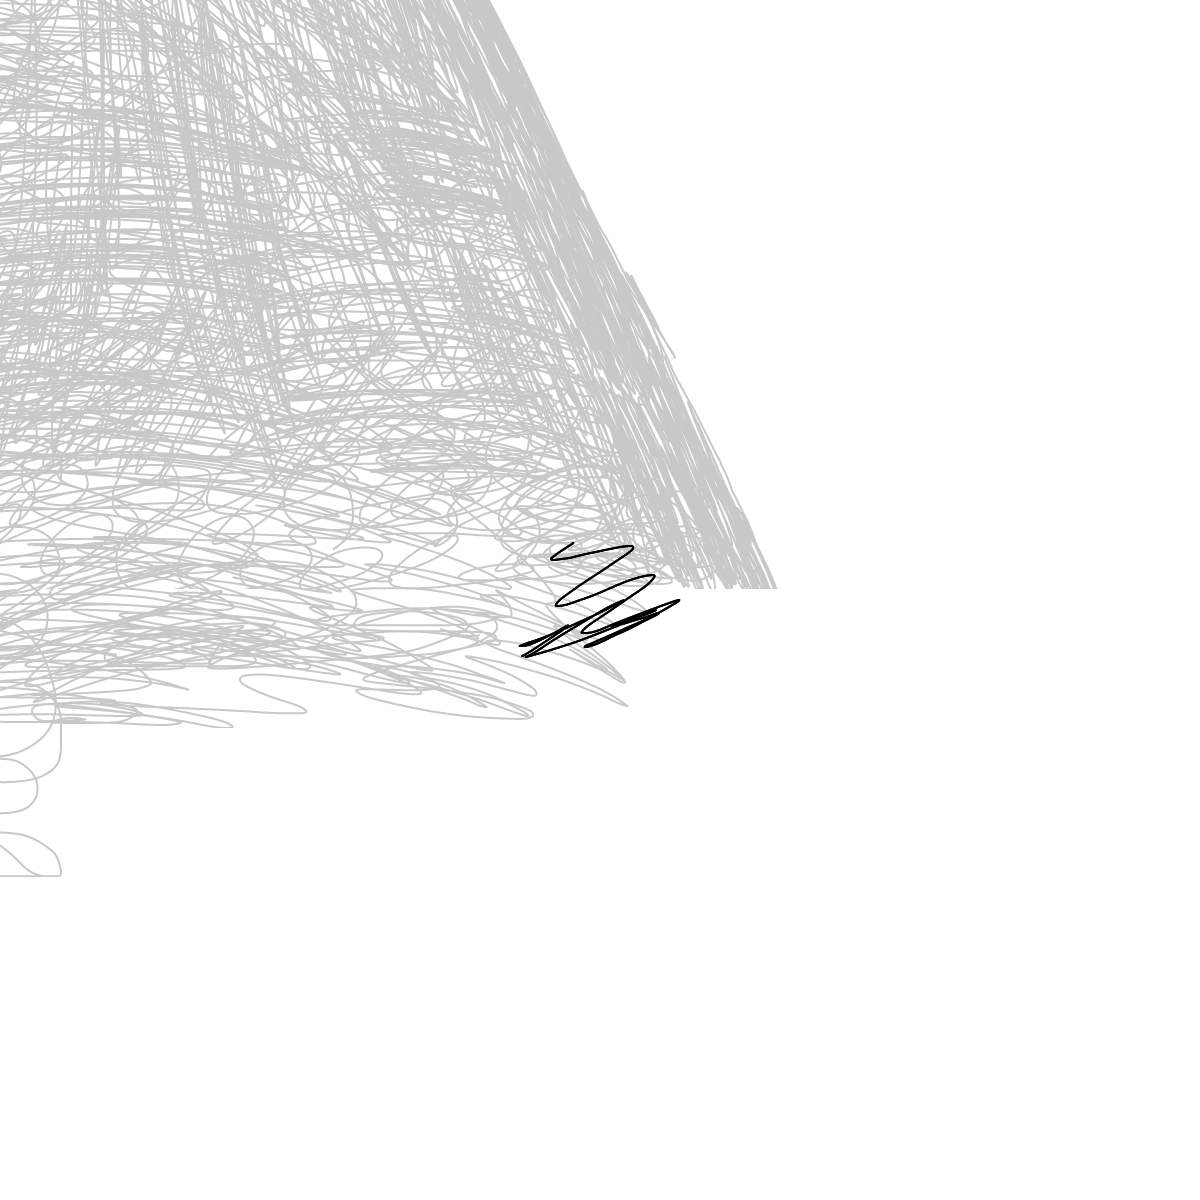 BAAAM drawing#6172 lat:52.4879608154296900lng: 13.4253730773925780